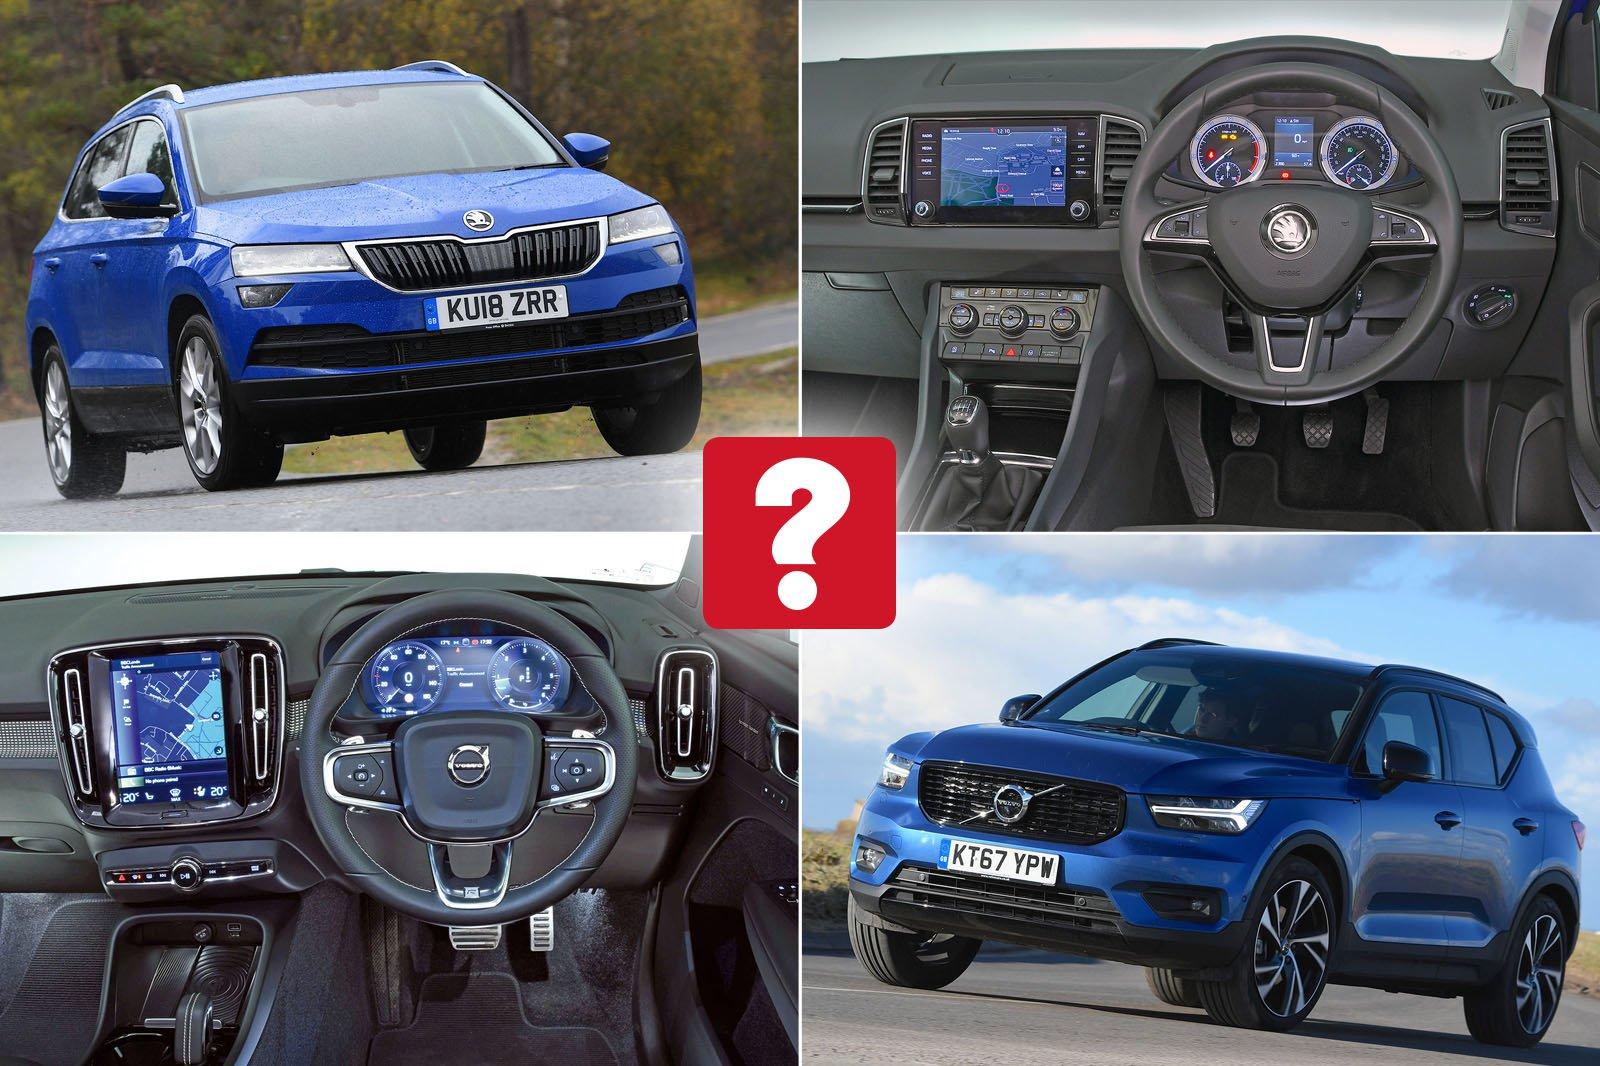 New Skoda Karoq vs used Volvo XC40: which is best?